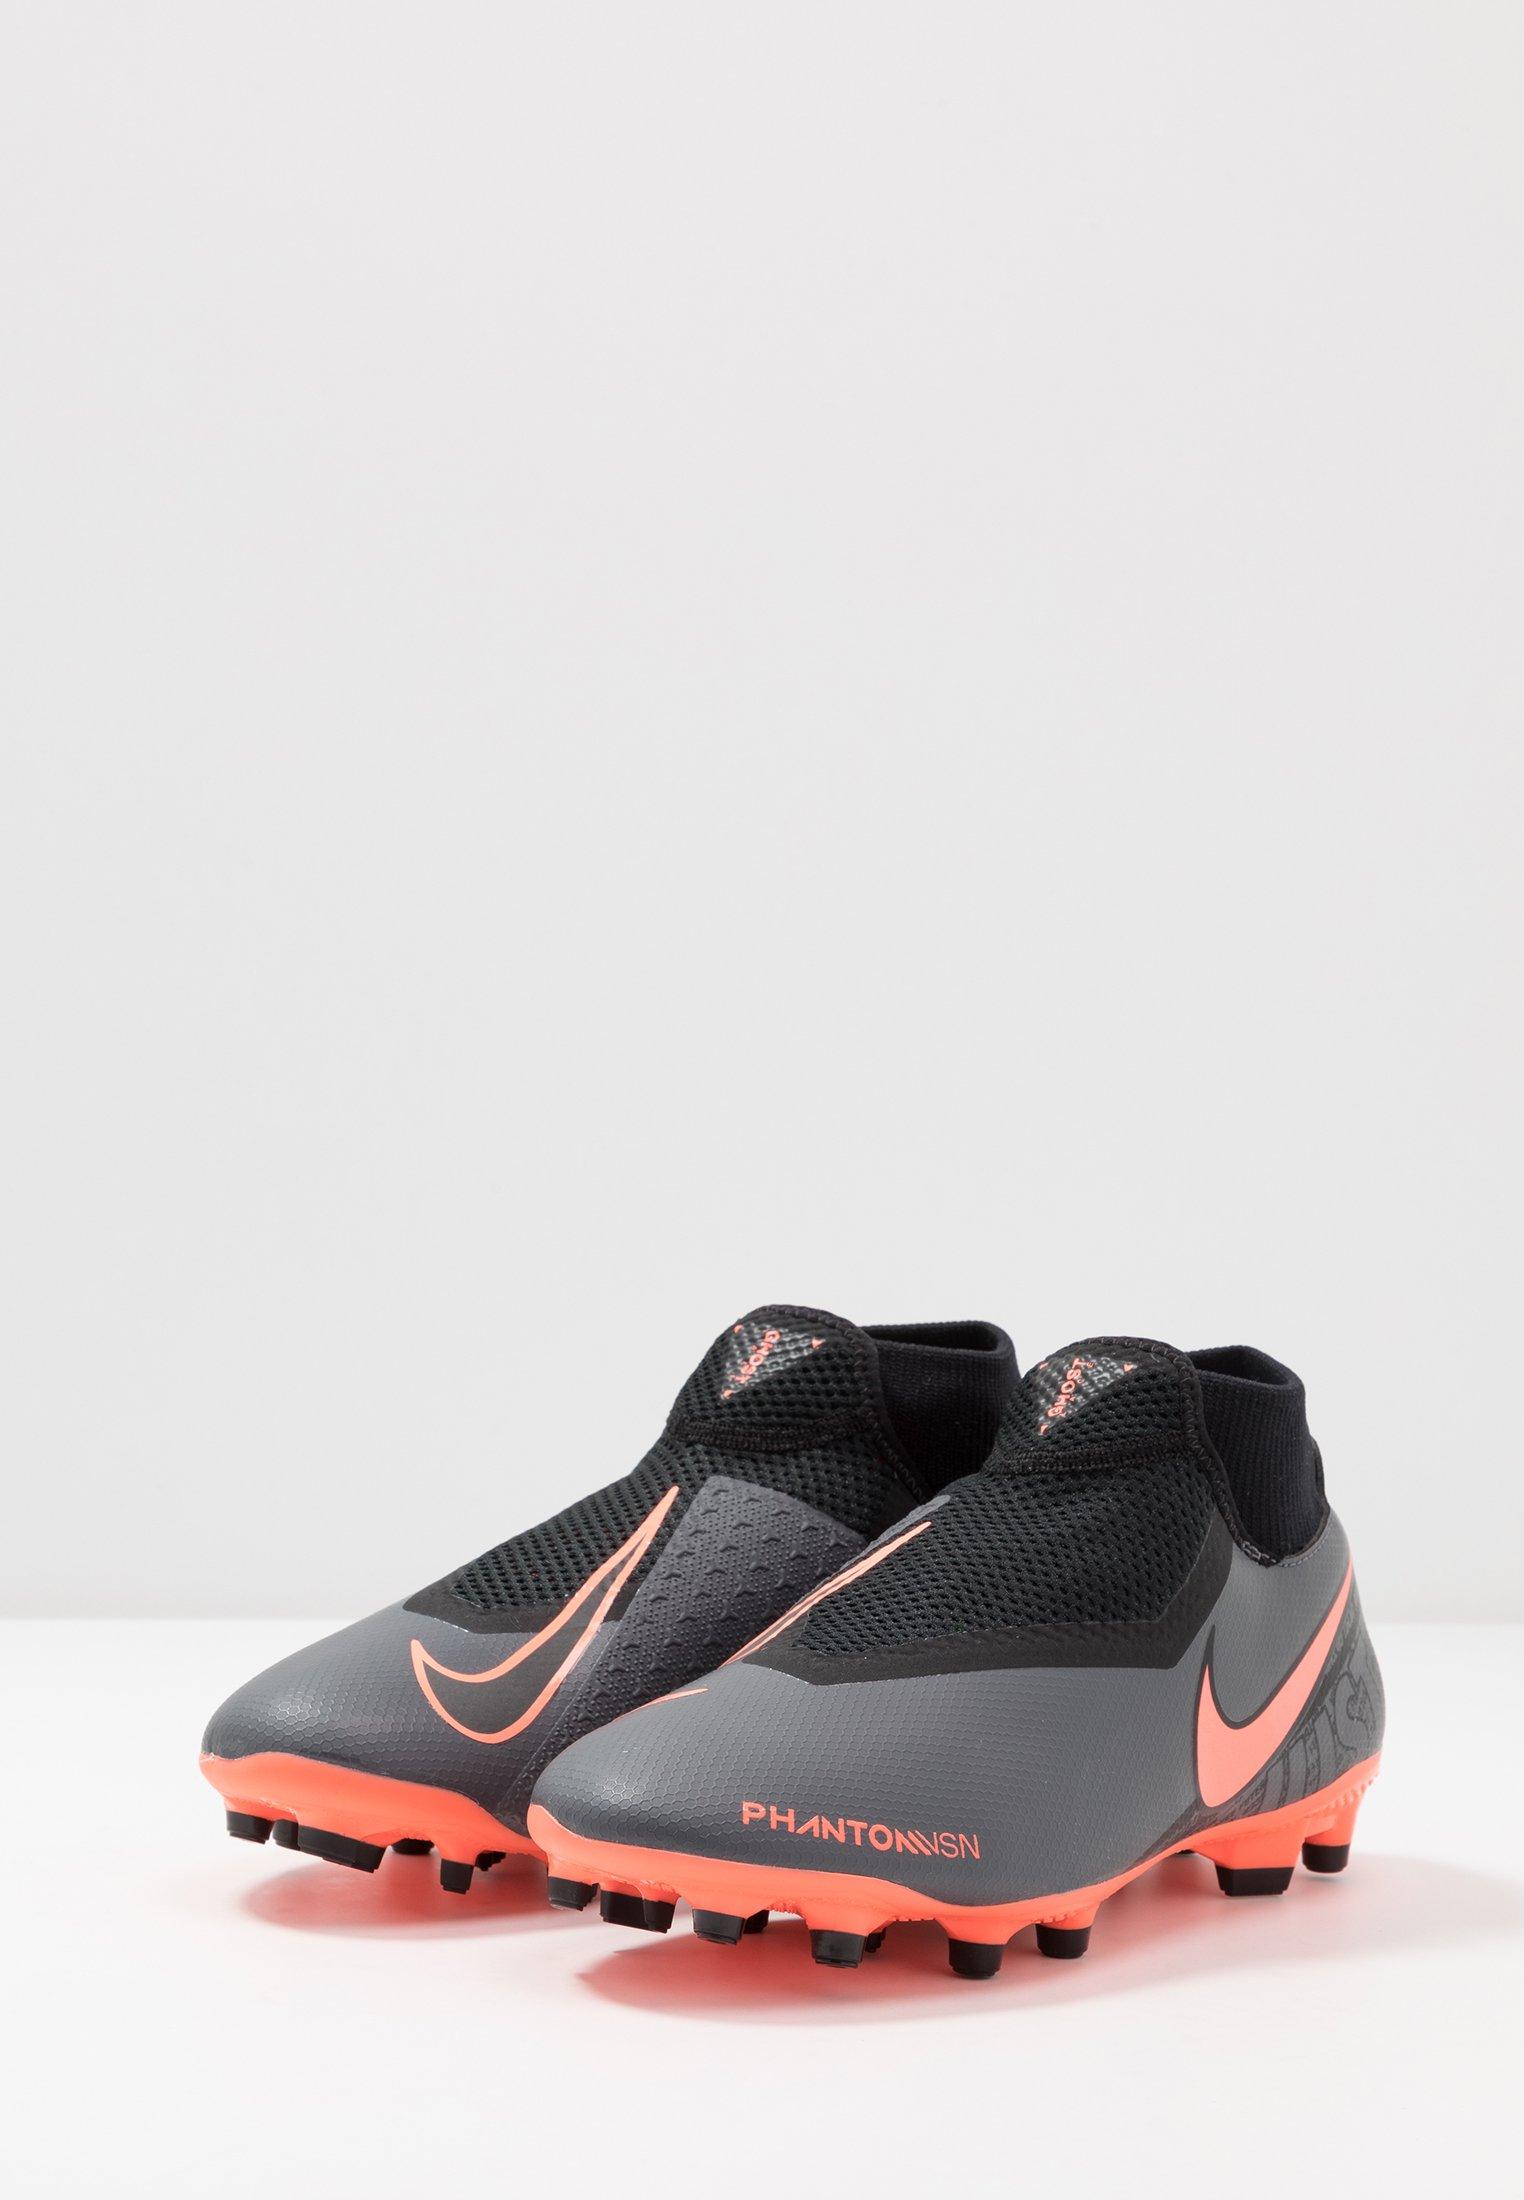 Nike Performance PHANTOM VSN ACADEMY DF FG/MG - Fußballschuh Nocken - dark grey/bright mango/black/dunkelgrau - Herrenschuhe i9Z7e